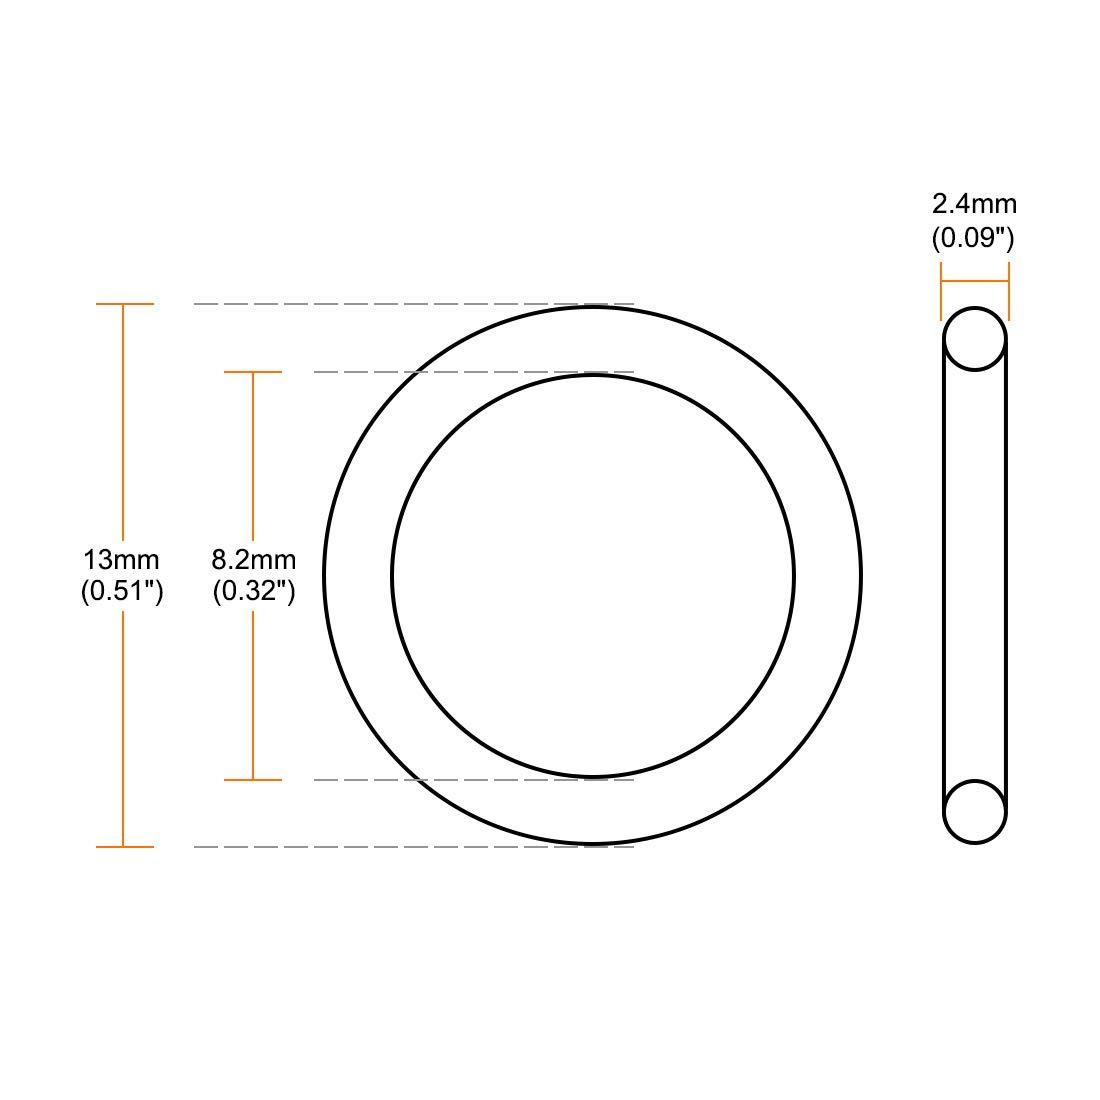 Seal Gasket Green 20Pcs 24mm OD uxcell Fluorine Rubber O Rings 2.4mm Width 19.2mm Inner Diameter